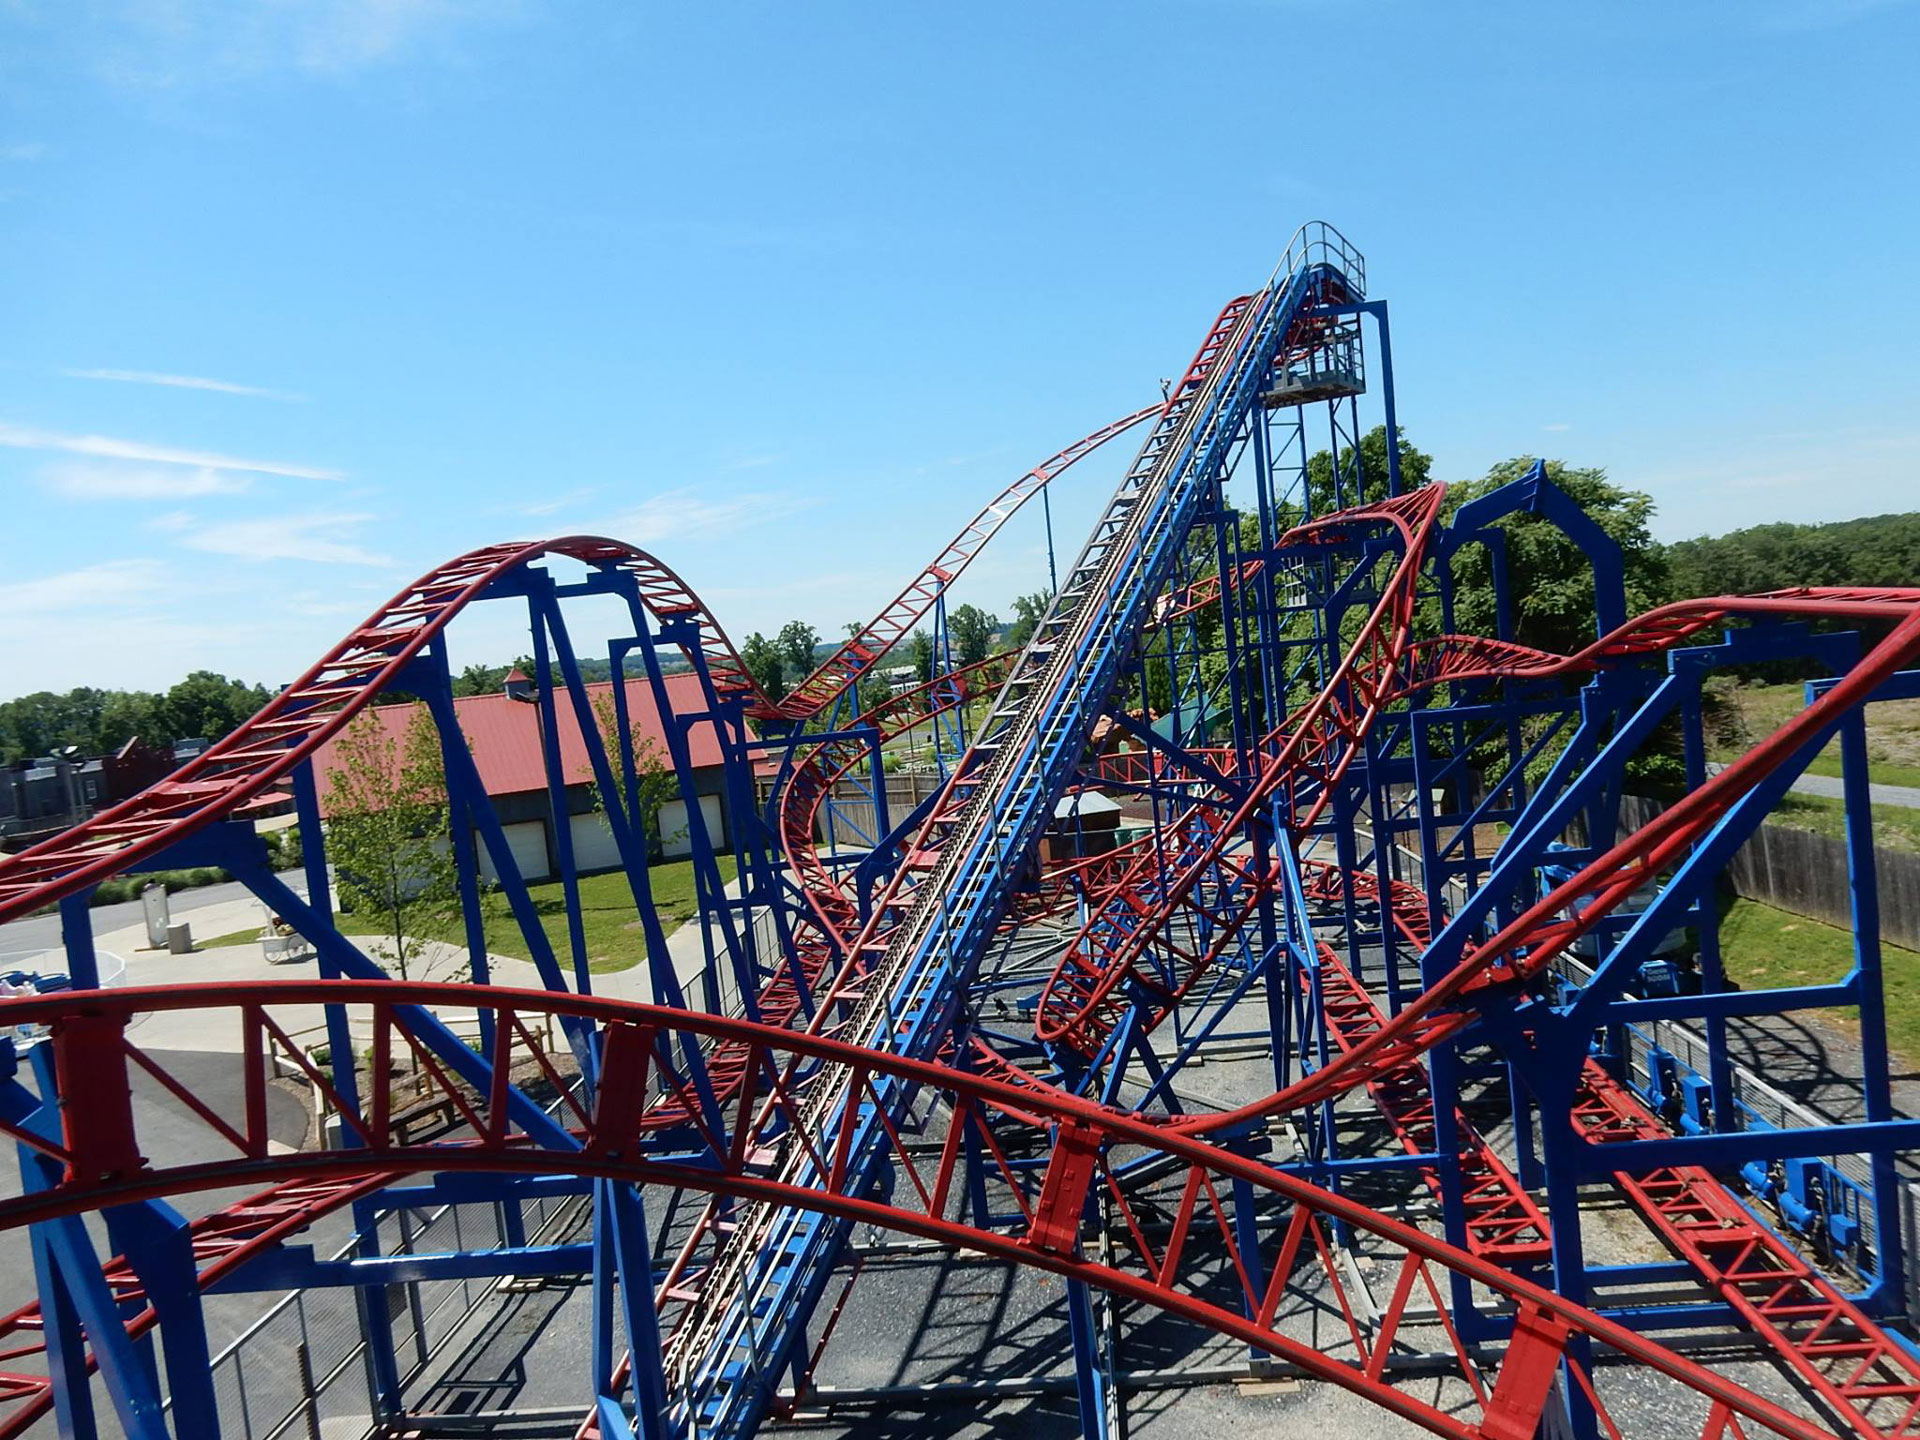 Zamperla Roller Coaster Videos Amp Facts Coasterforce